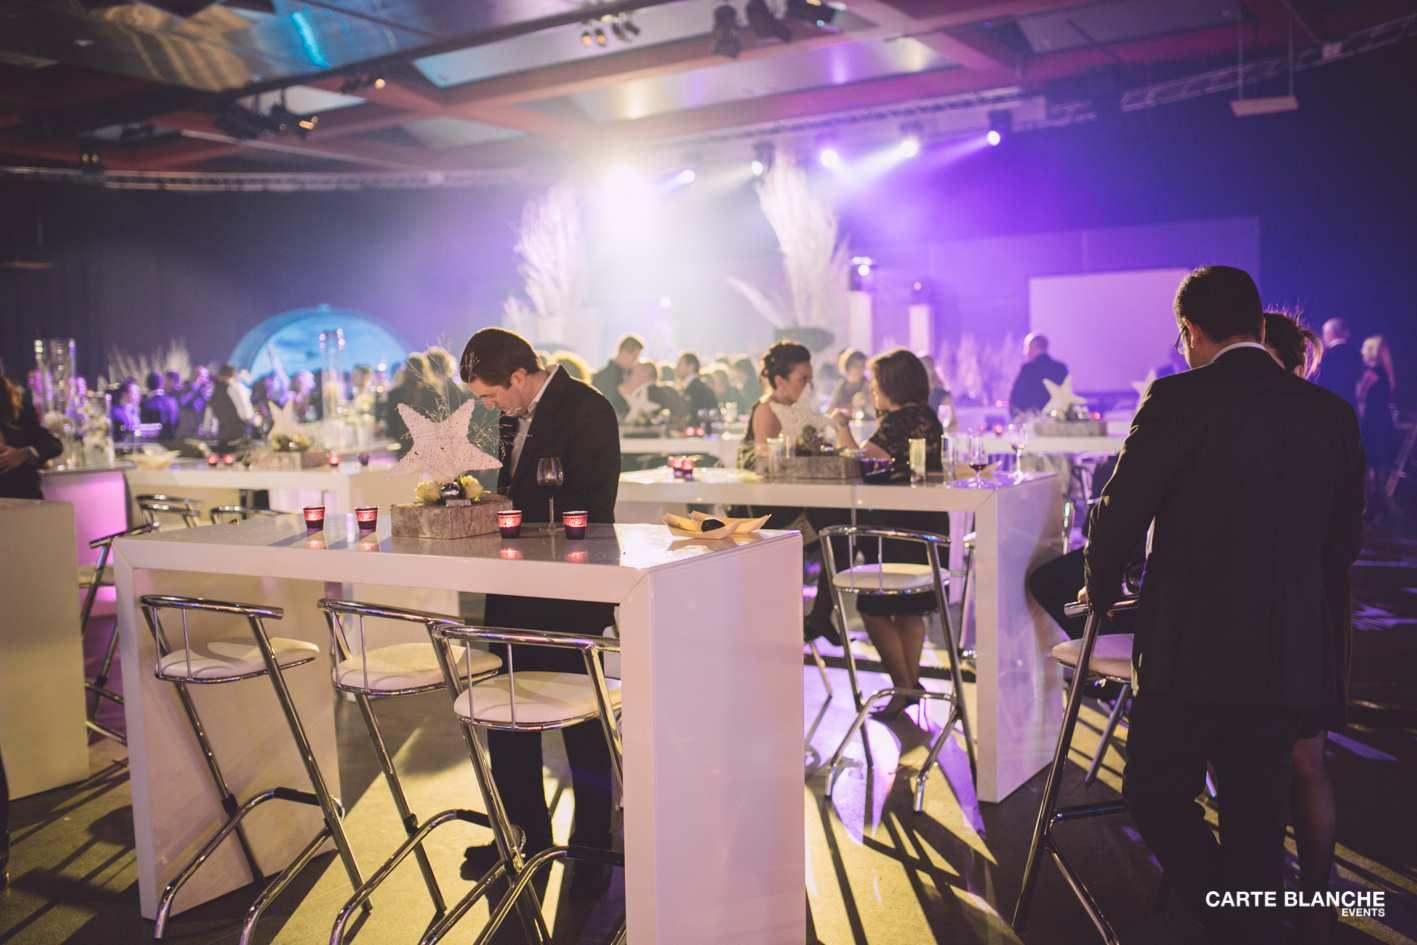 xmas-party-ferrero-2013-partage-rencontre-projet